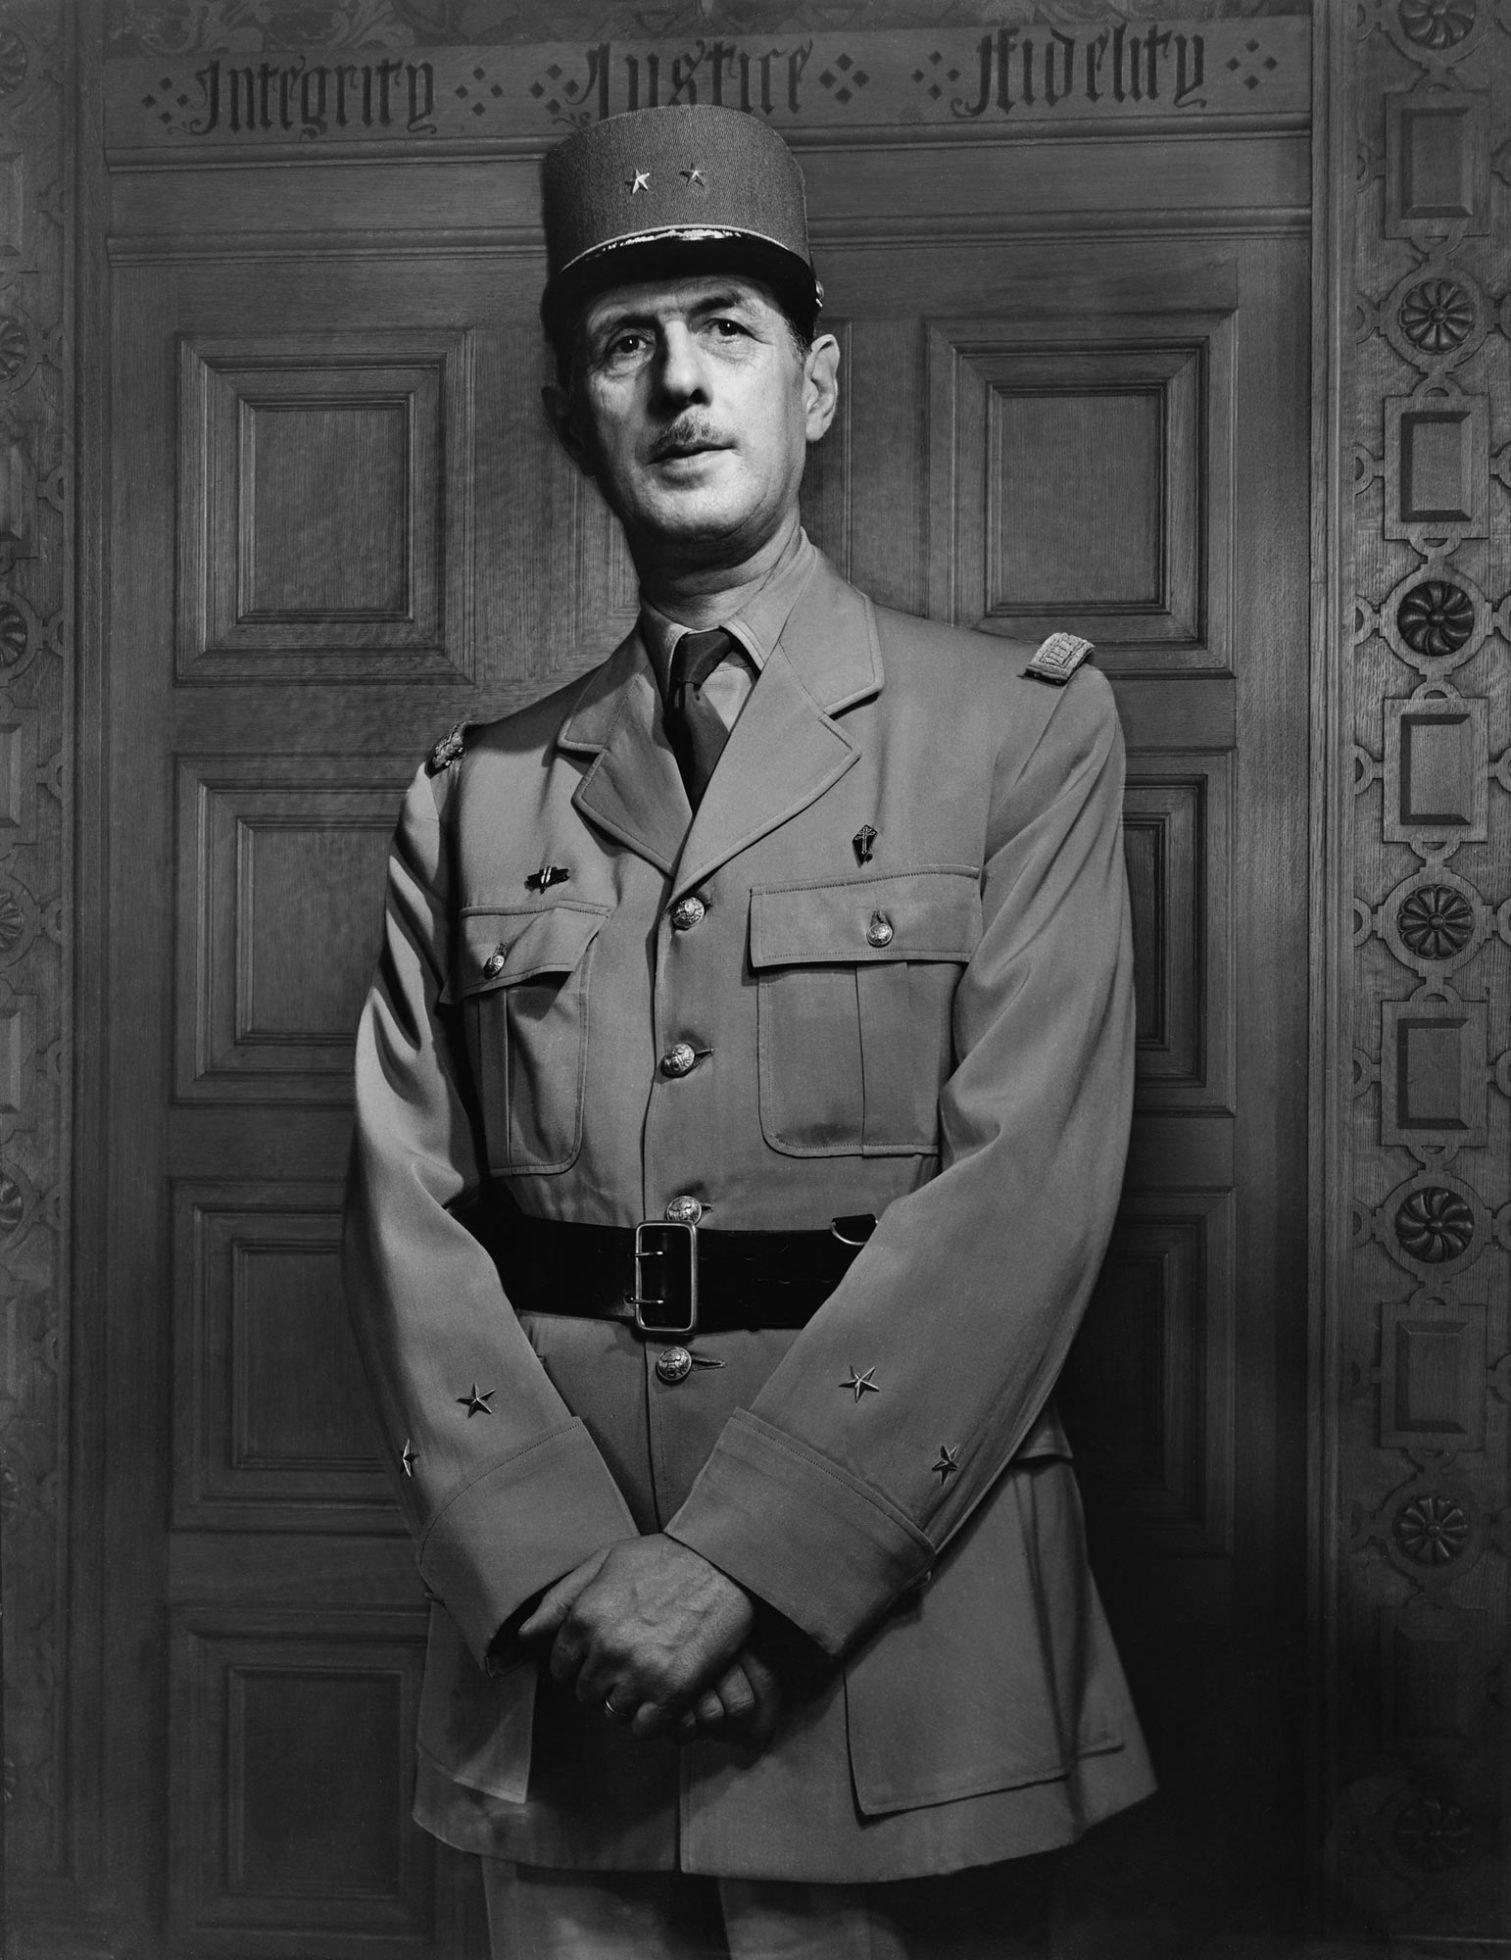 General Charles deGaulle